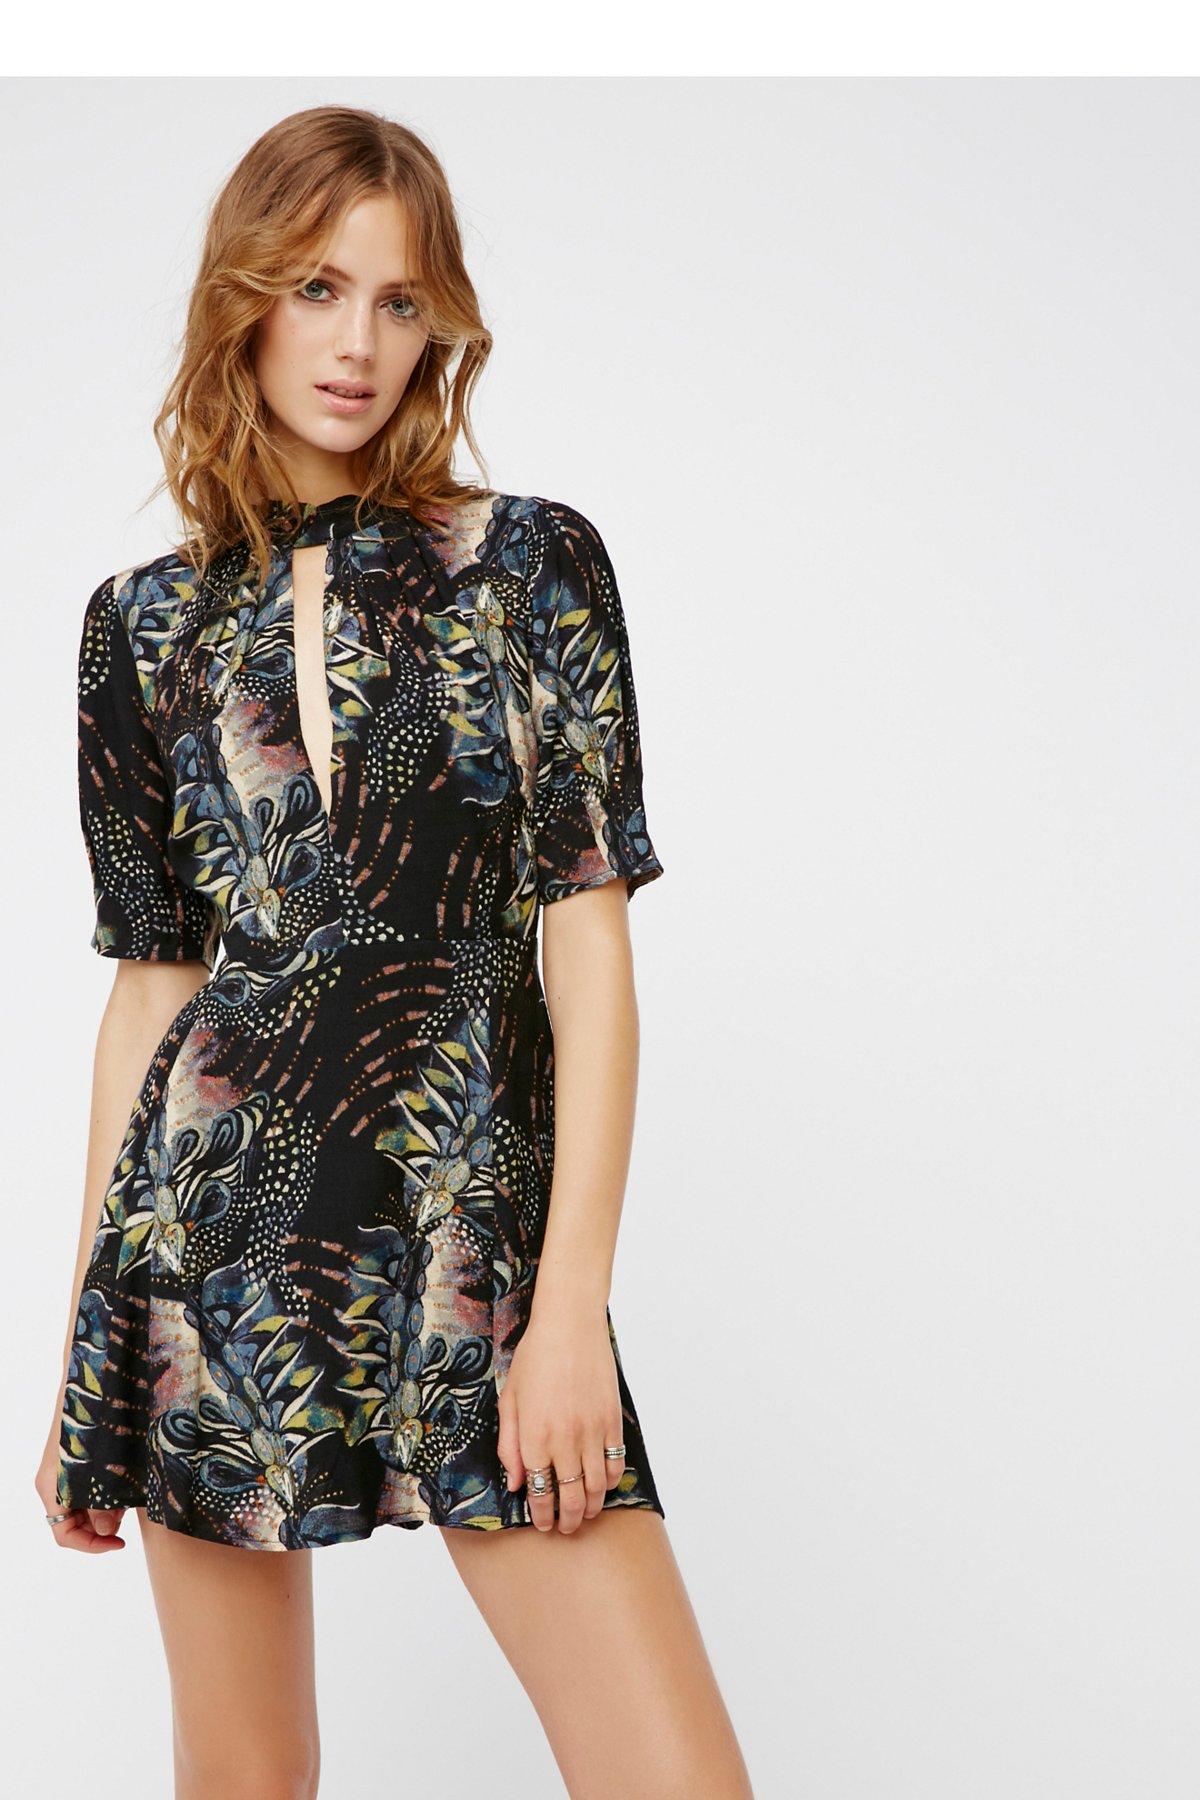 Glassgow几何图案迷你连衣裙